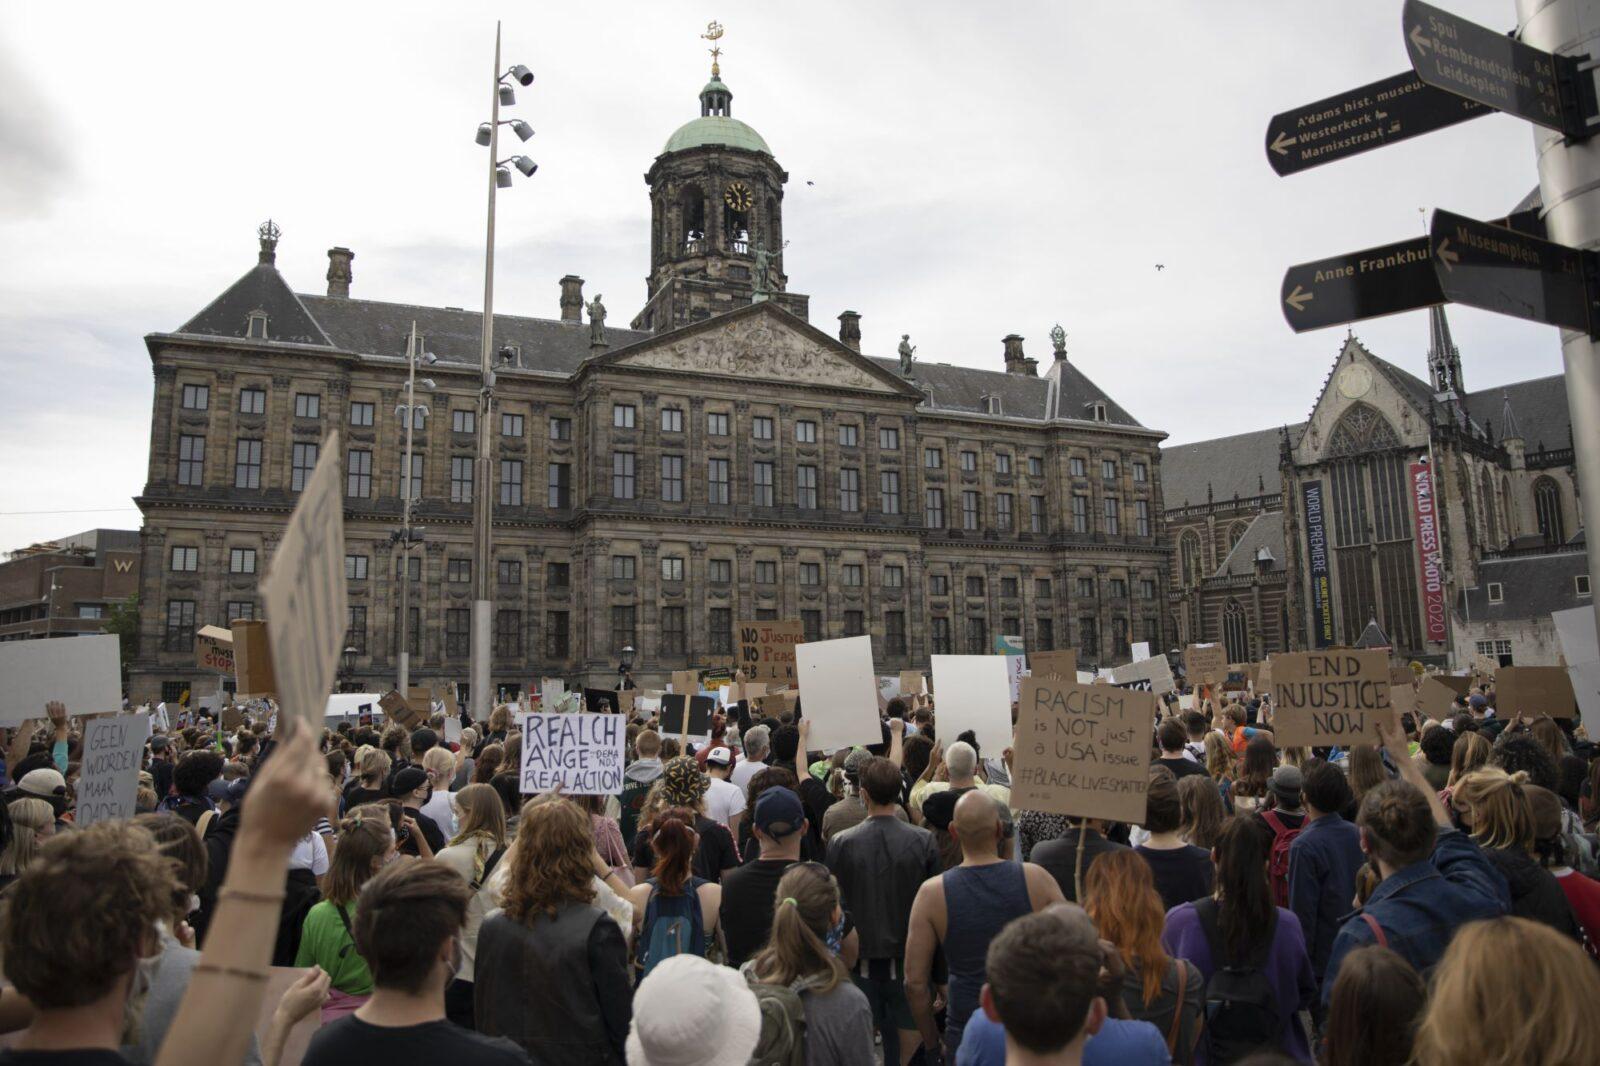 Black Lives Matter demonstratie Amsterdam foto Wouter Sterrenburg (3 of 10) (2000px)